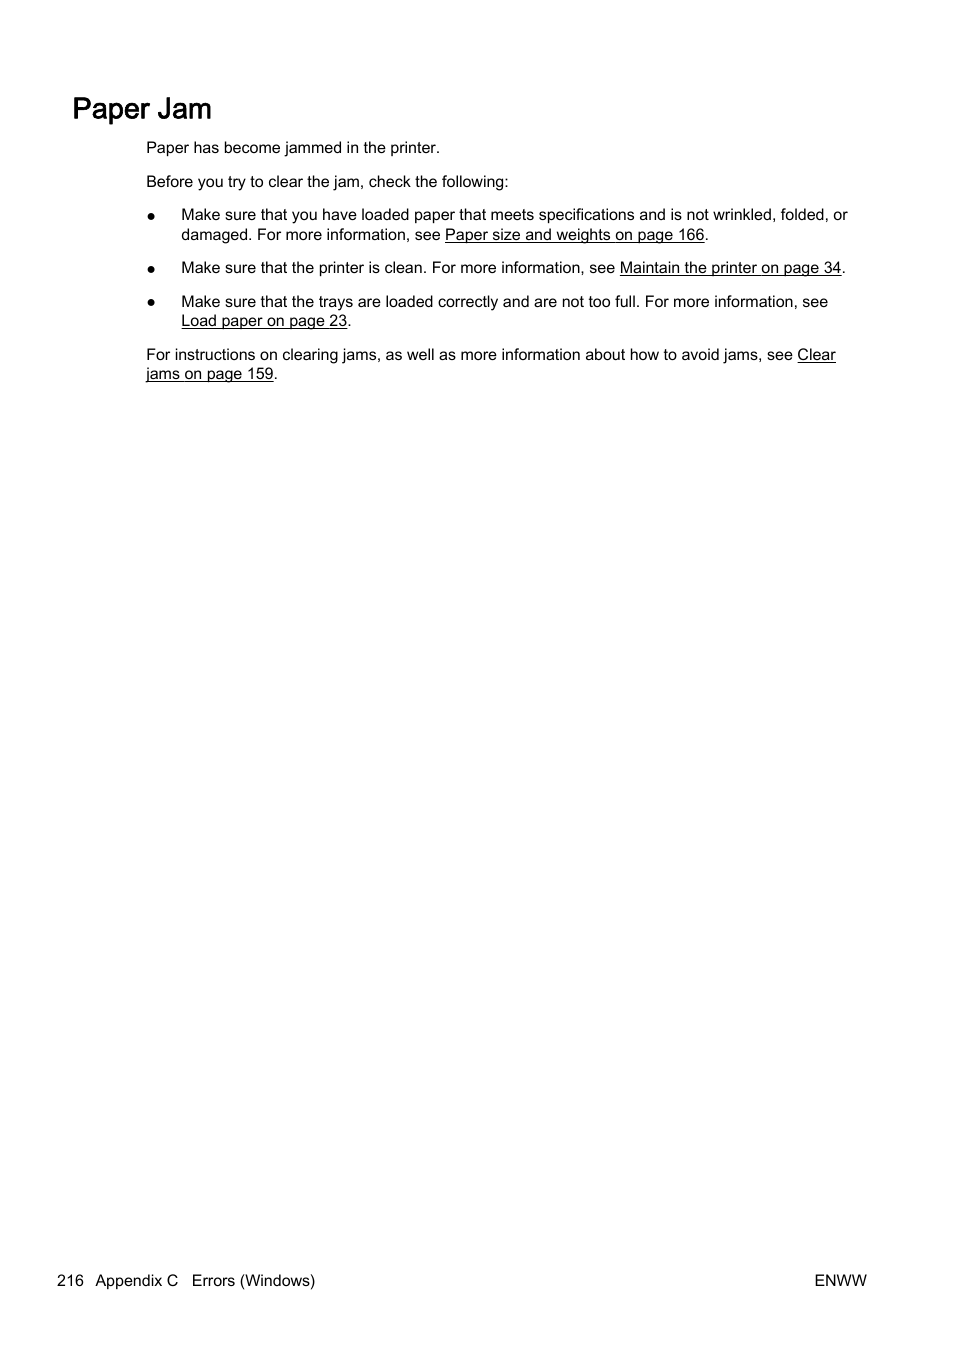 Paper jam | HP Officejet Pro 8610 e-All-in-One Printer User Manual